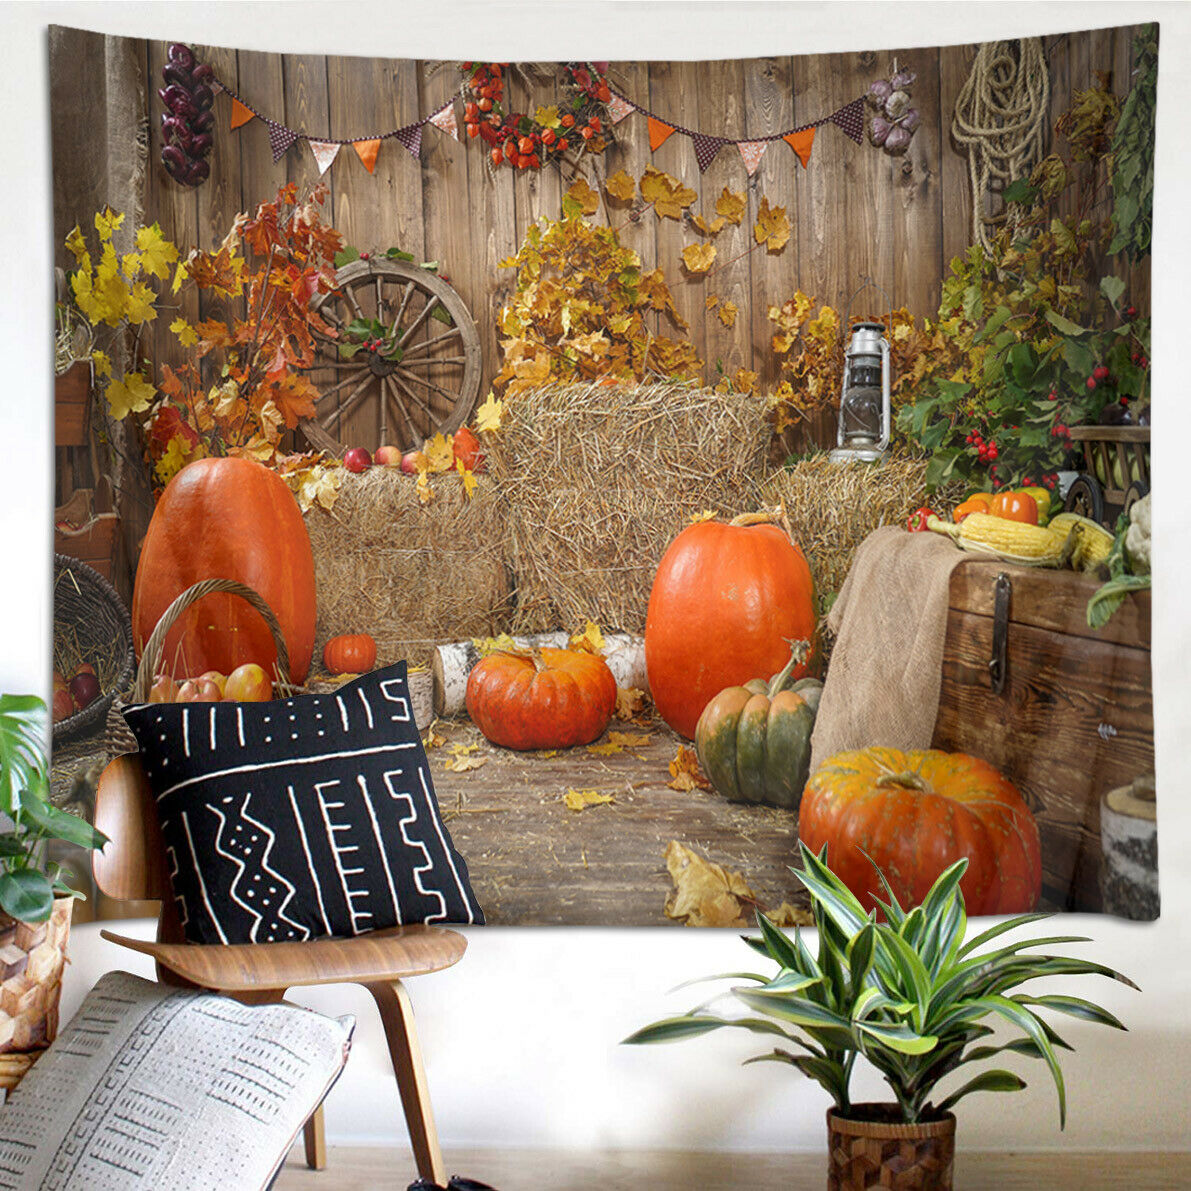 Thanksgiving Decor Autumn Hay Pumpkins Tapestry Wall Hanging Living Room Bedroom